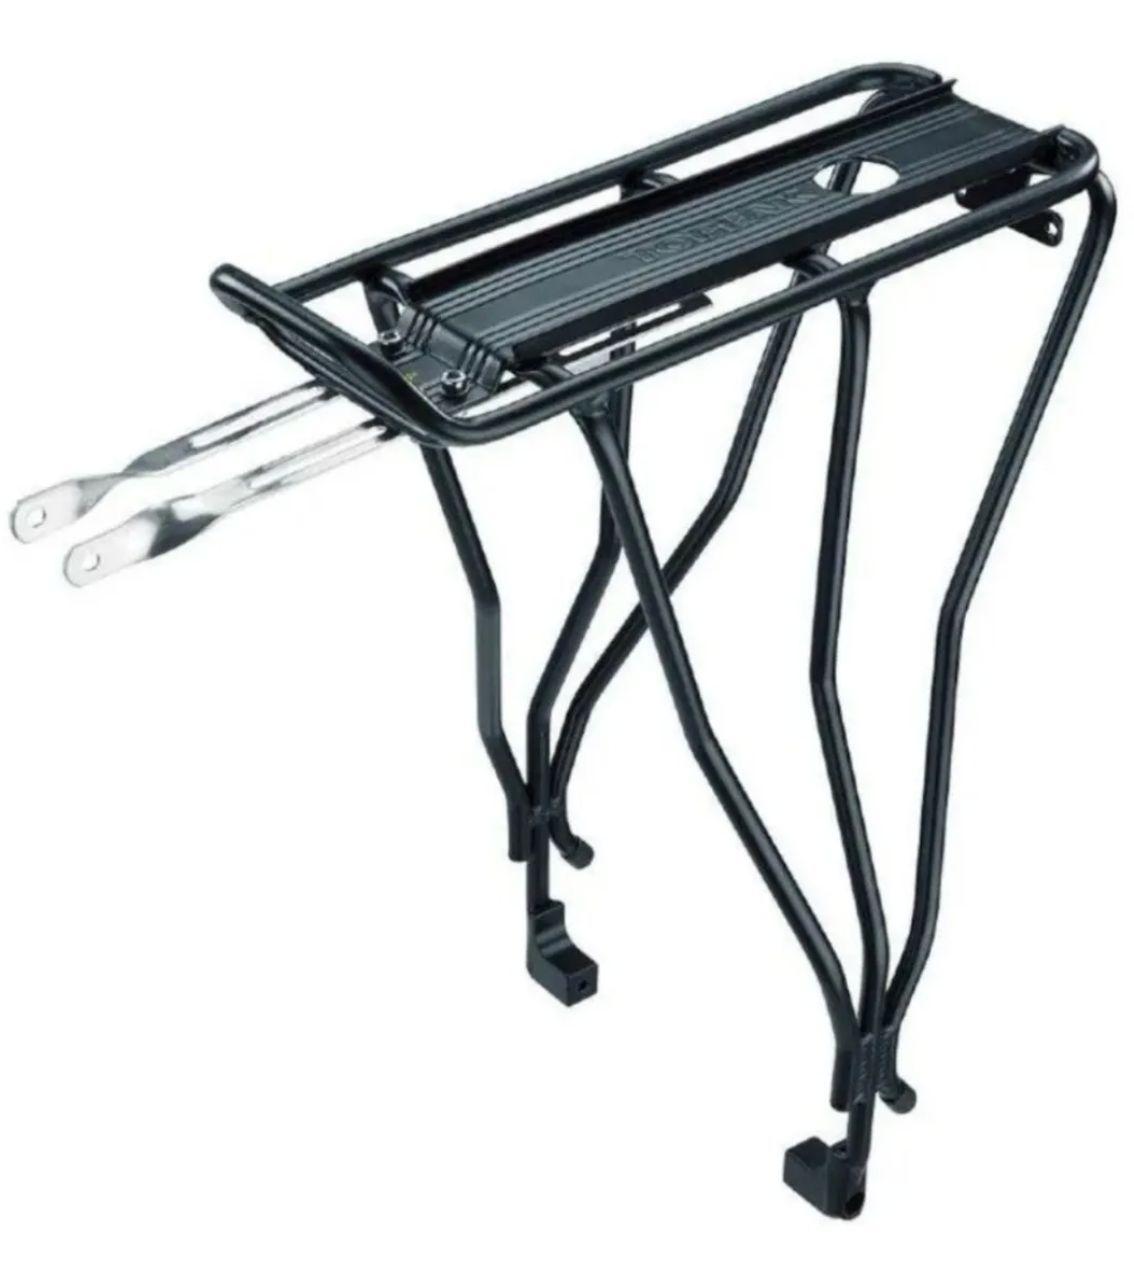 Bagageiro Traseiro Topeak Babyseat 2 Dc Aro 29 Bike